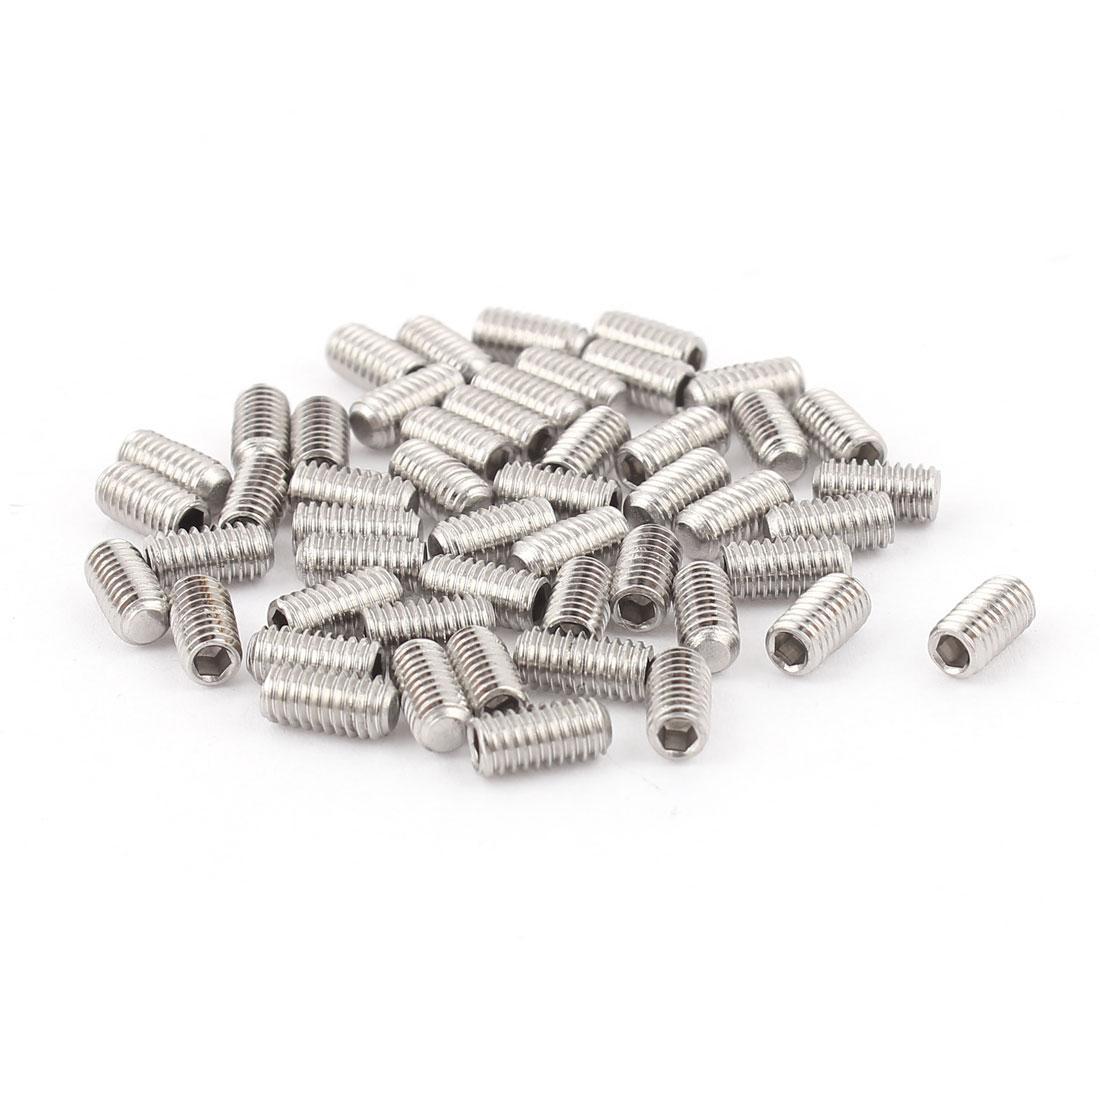 4mm x 8mm Stainless Steel Hexagon Socket Head Set Cup Point Grub Screws 50pcs